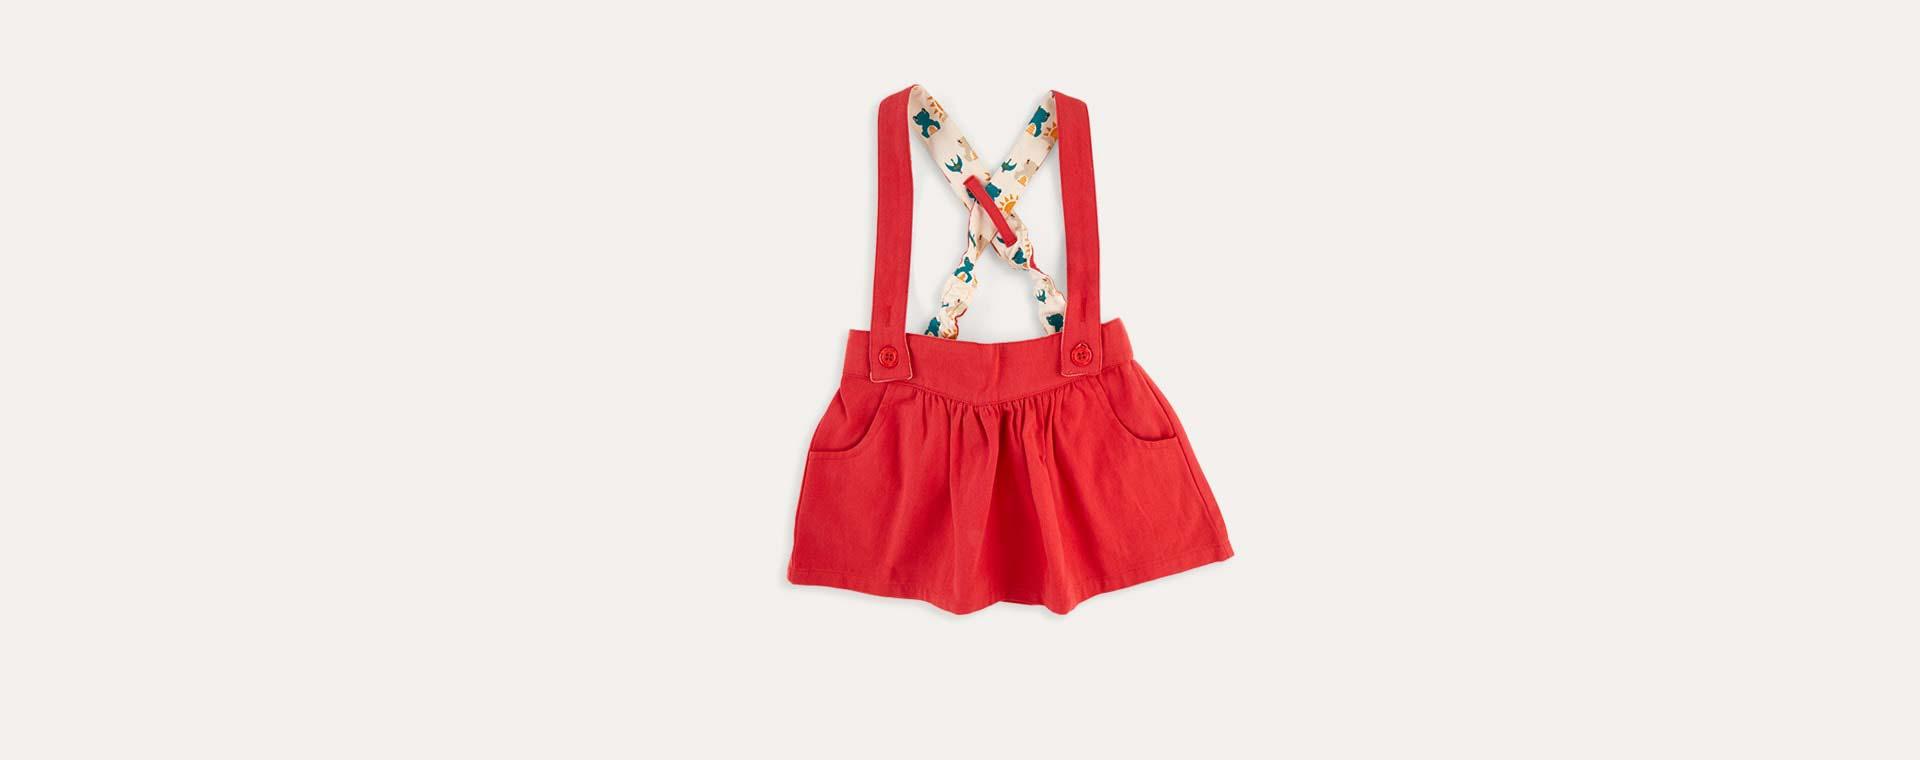 Red Little Green Radicals Skirt